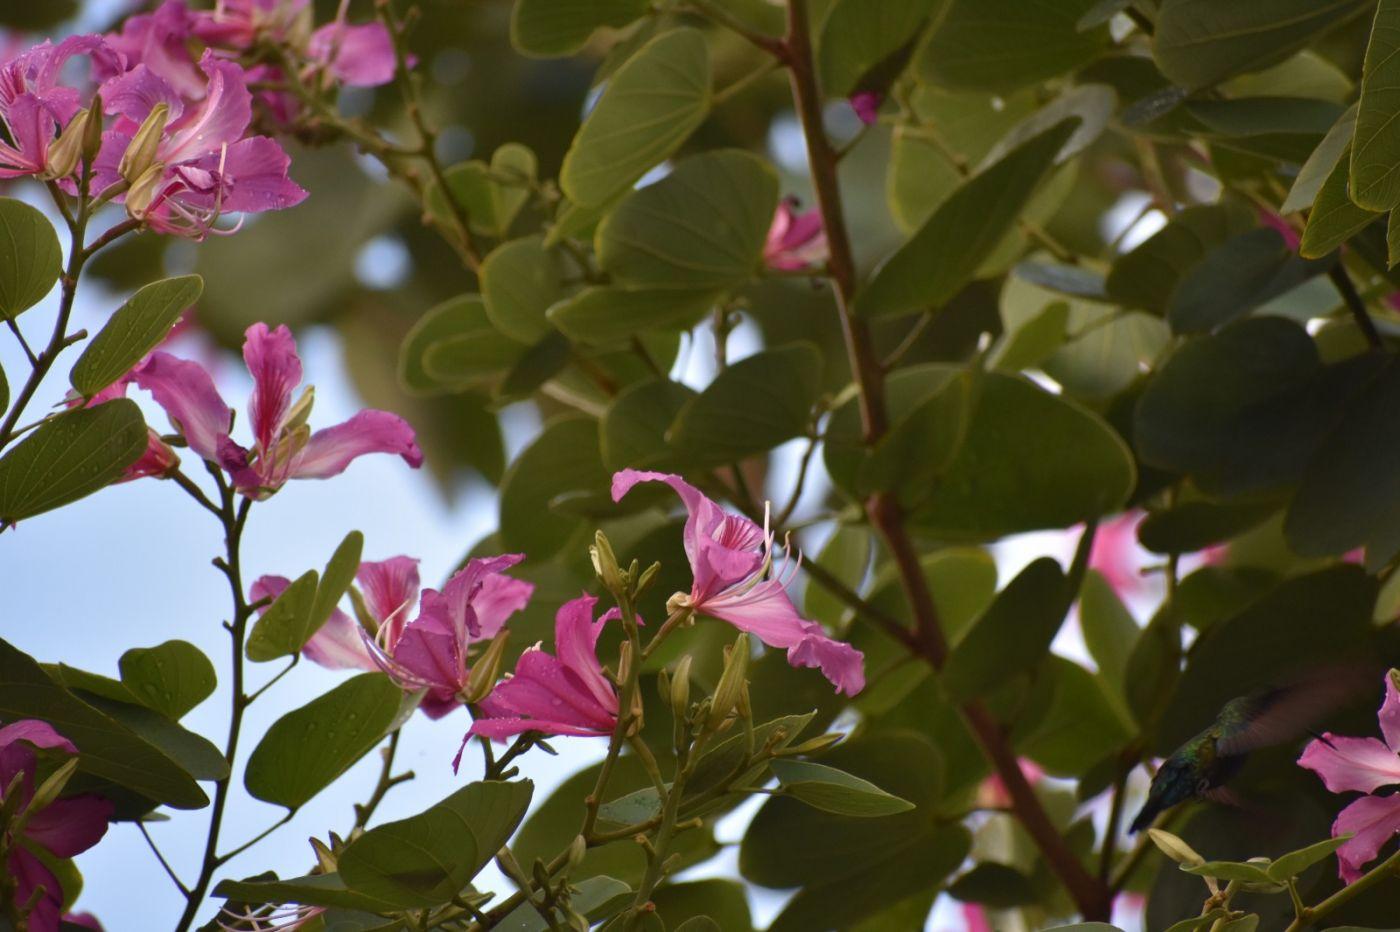 红花羊蹄甲_图1-21